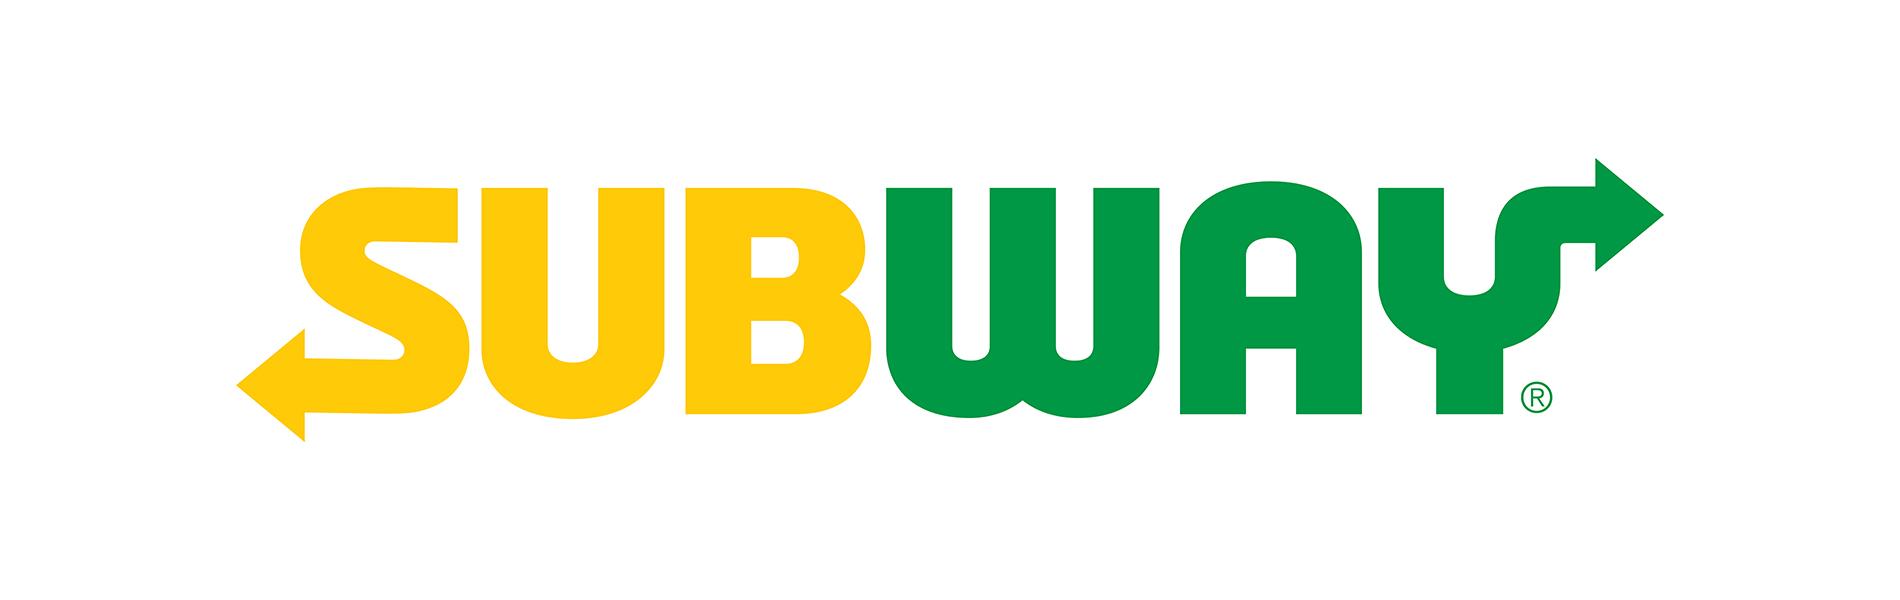 SUBWAY® RESTAURANTS REVEALS BOLD NEW LOGO AND SYMBOL